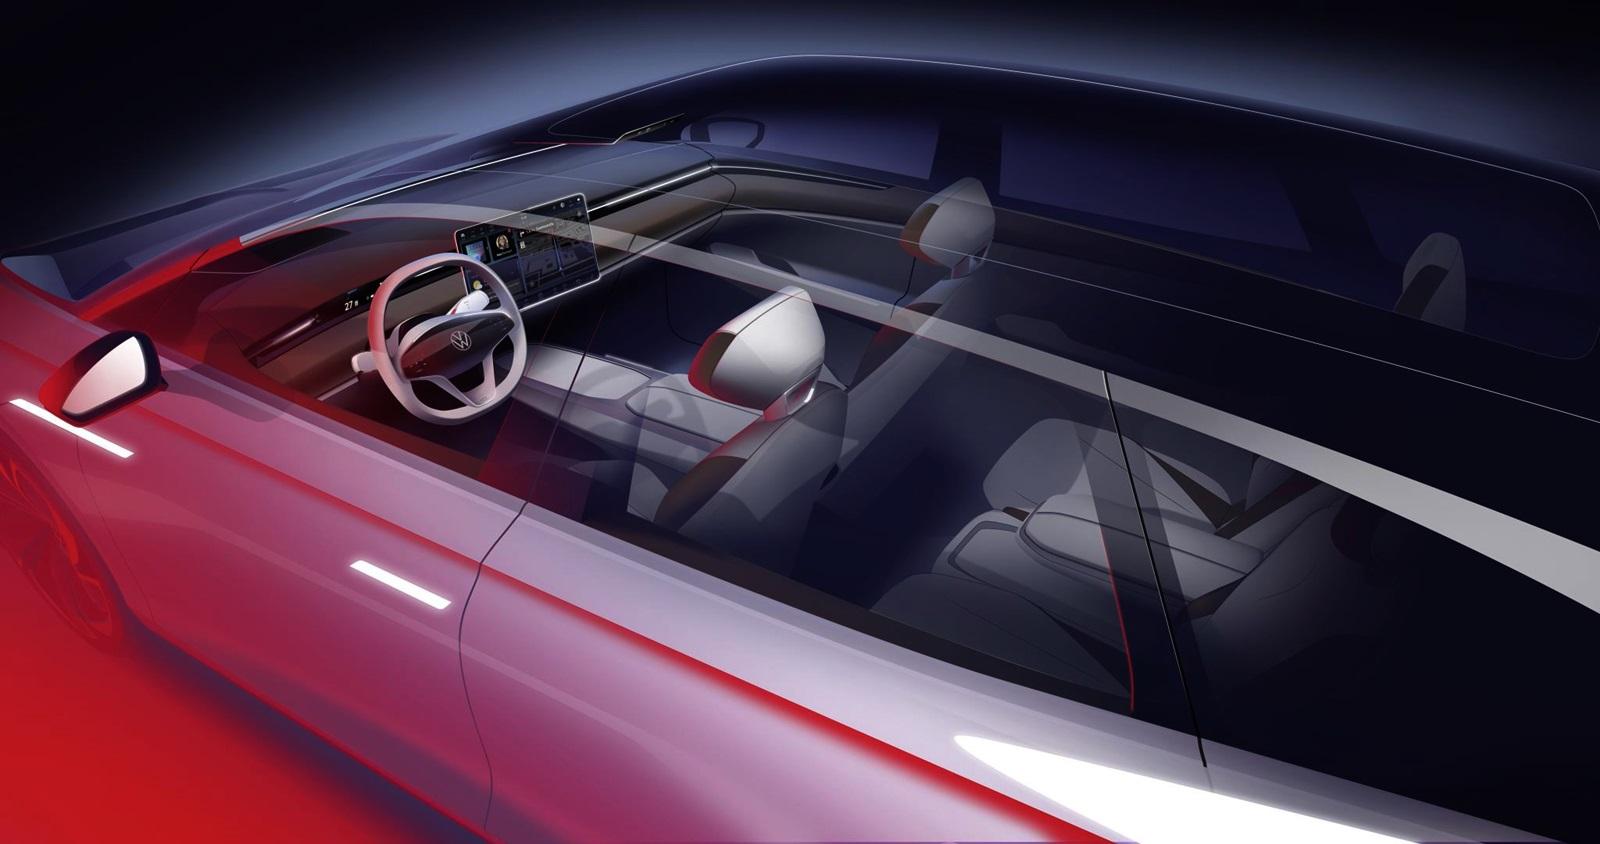 Volkswagen Id Space Vizzion (2)